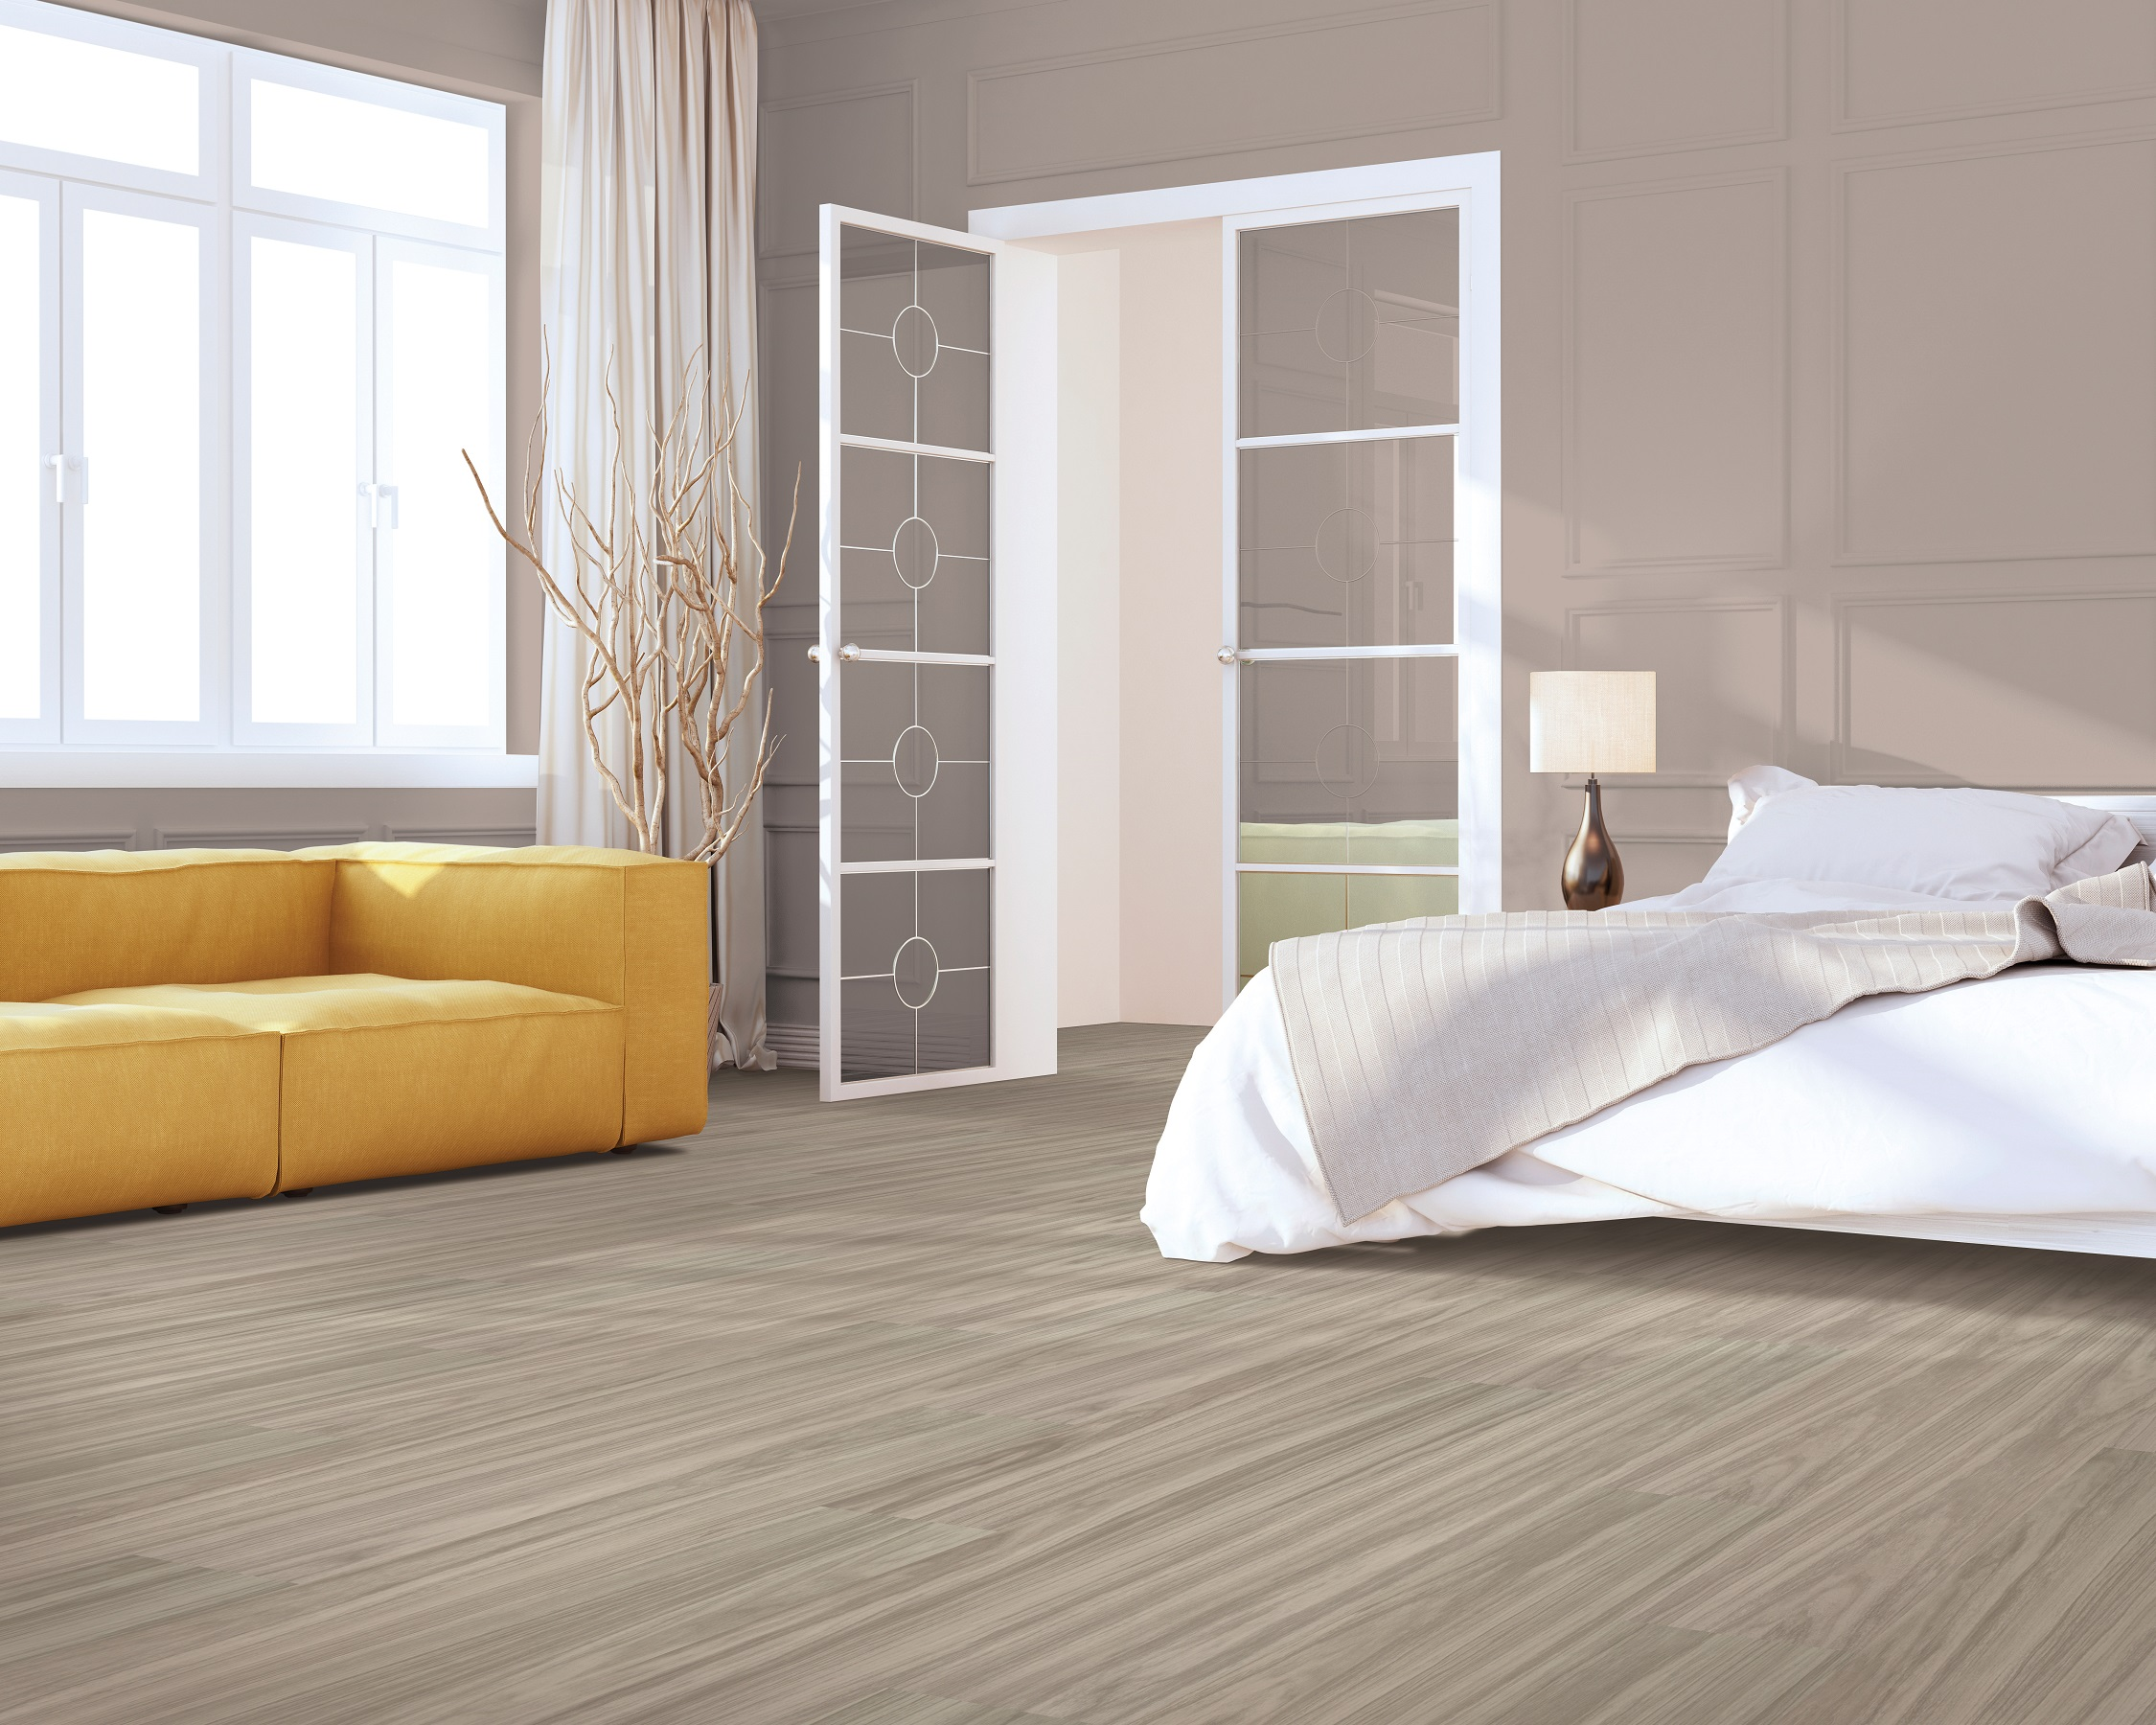 Luxury vinyl plank flooring in a Fort Myers, FL home